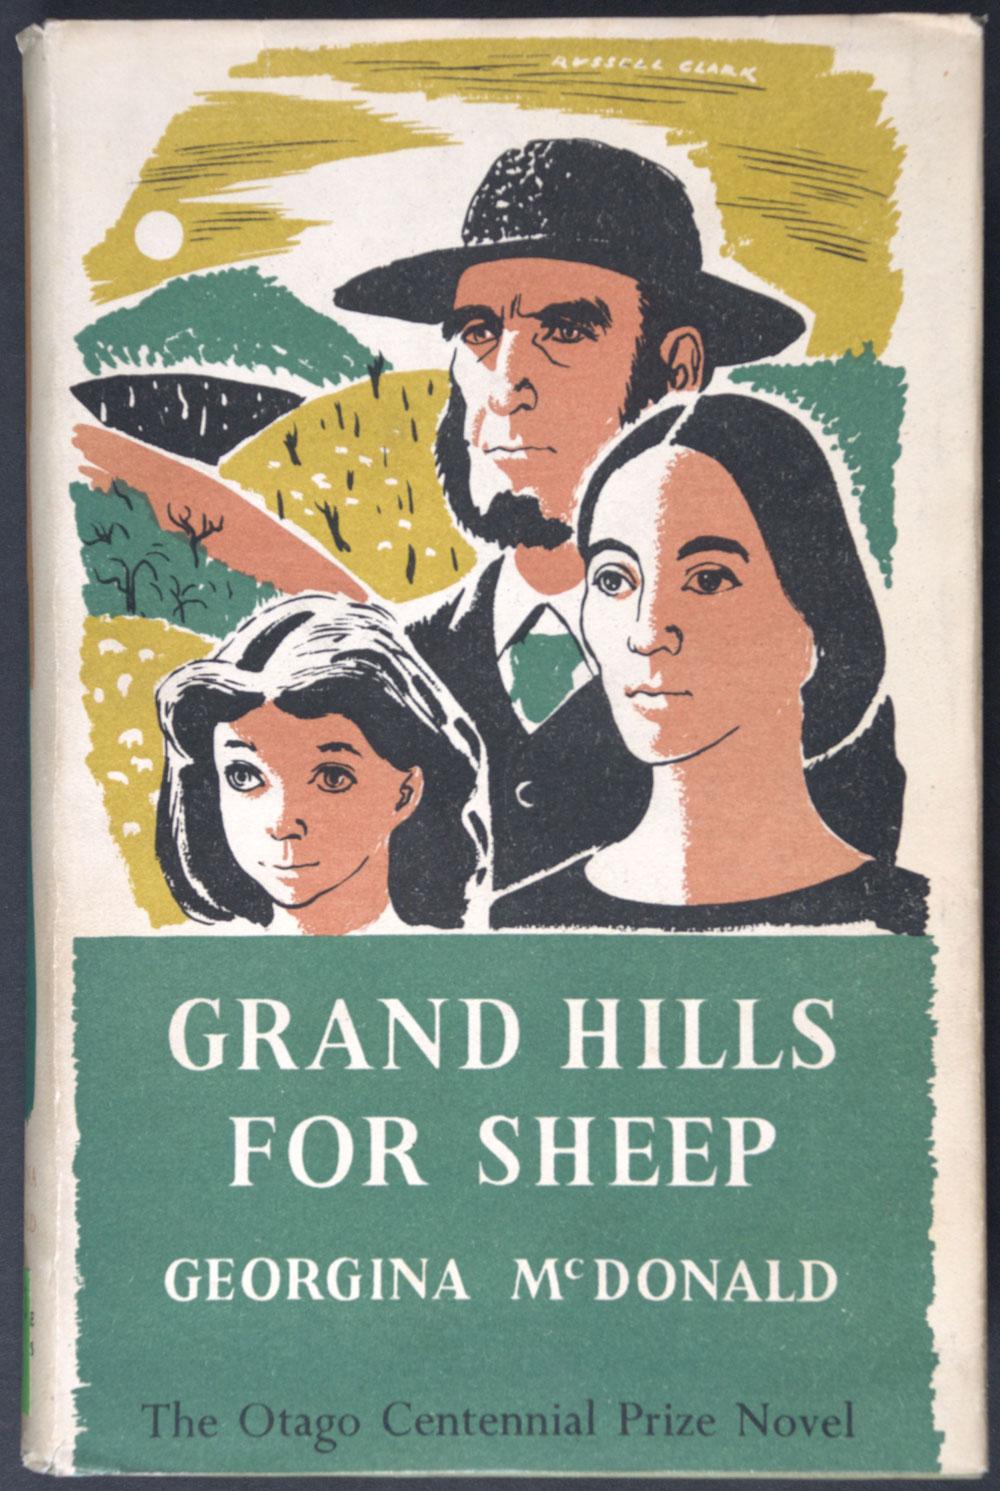 McDonald, Georgina. <em>Grand hills for sheep.</em> Christchurch: Whitcombe & Tombs, 1949.